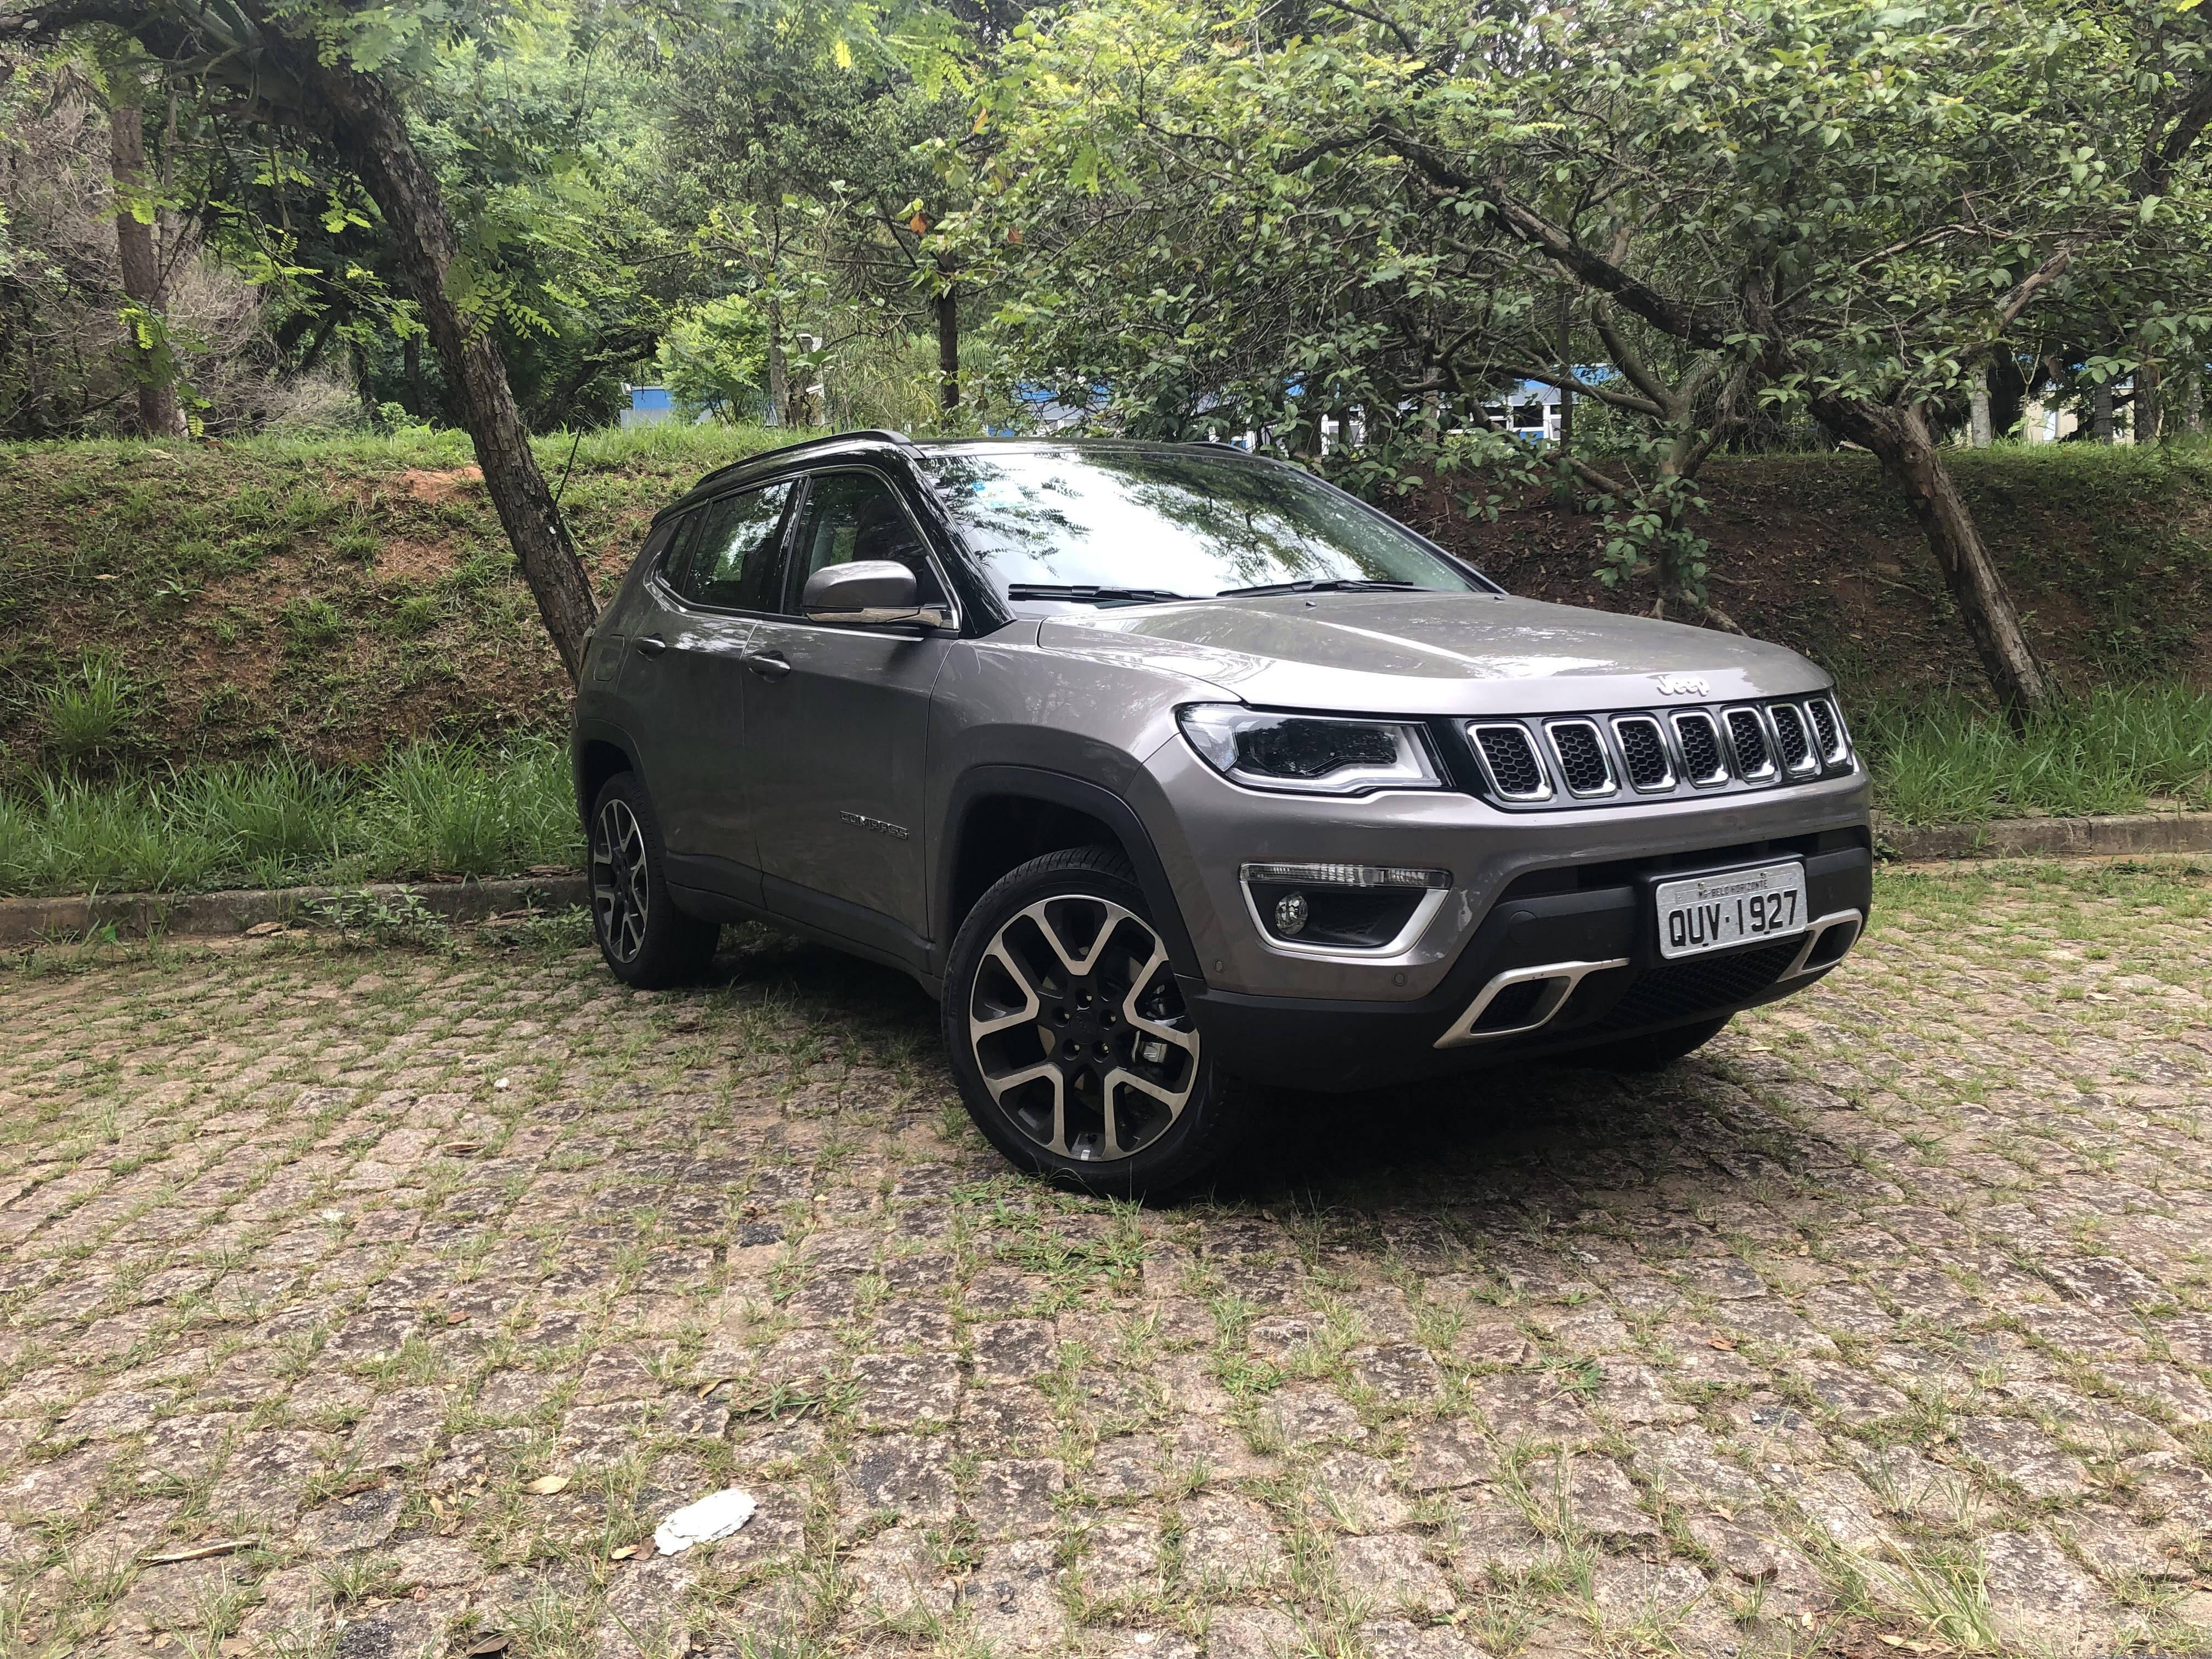 Jeep Compass Limited 2020. Foto: Caue Lira/iG